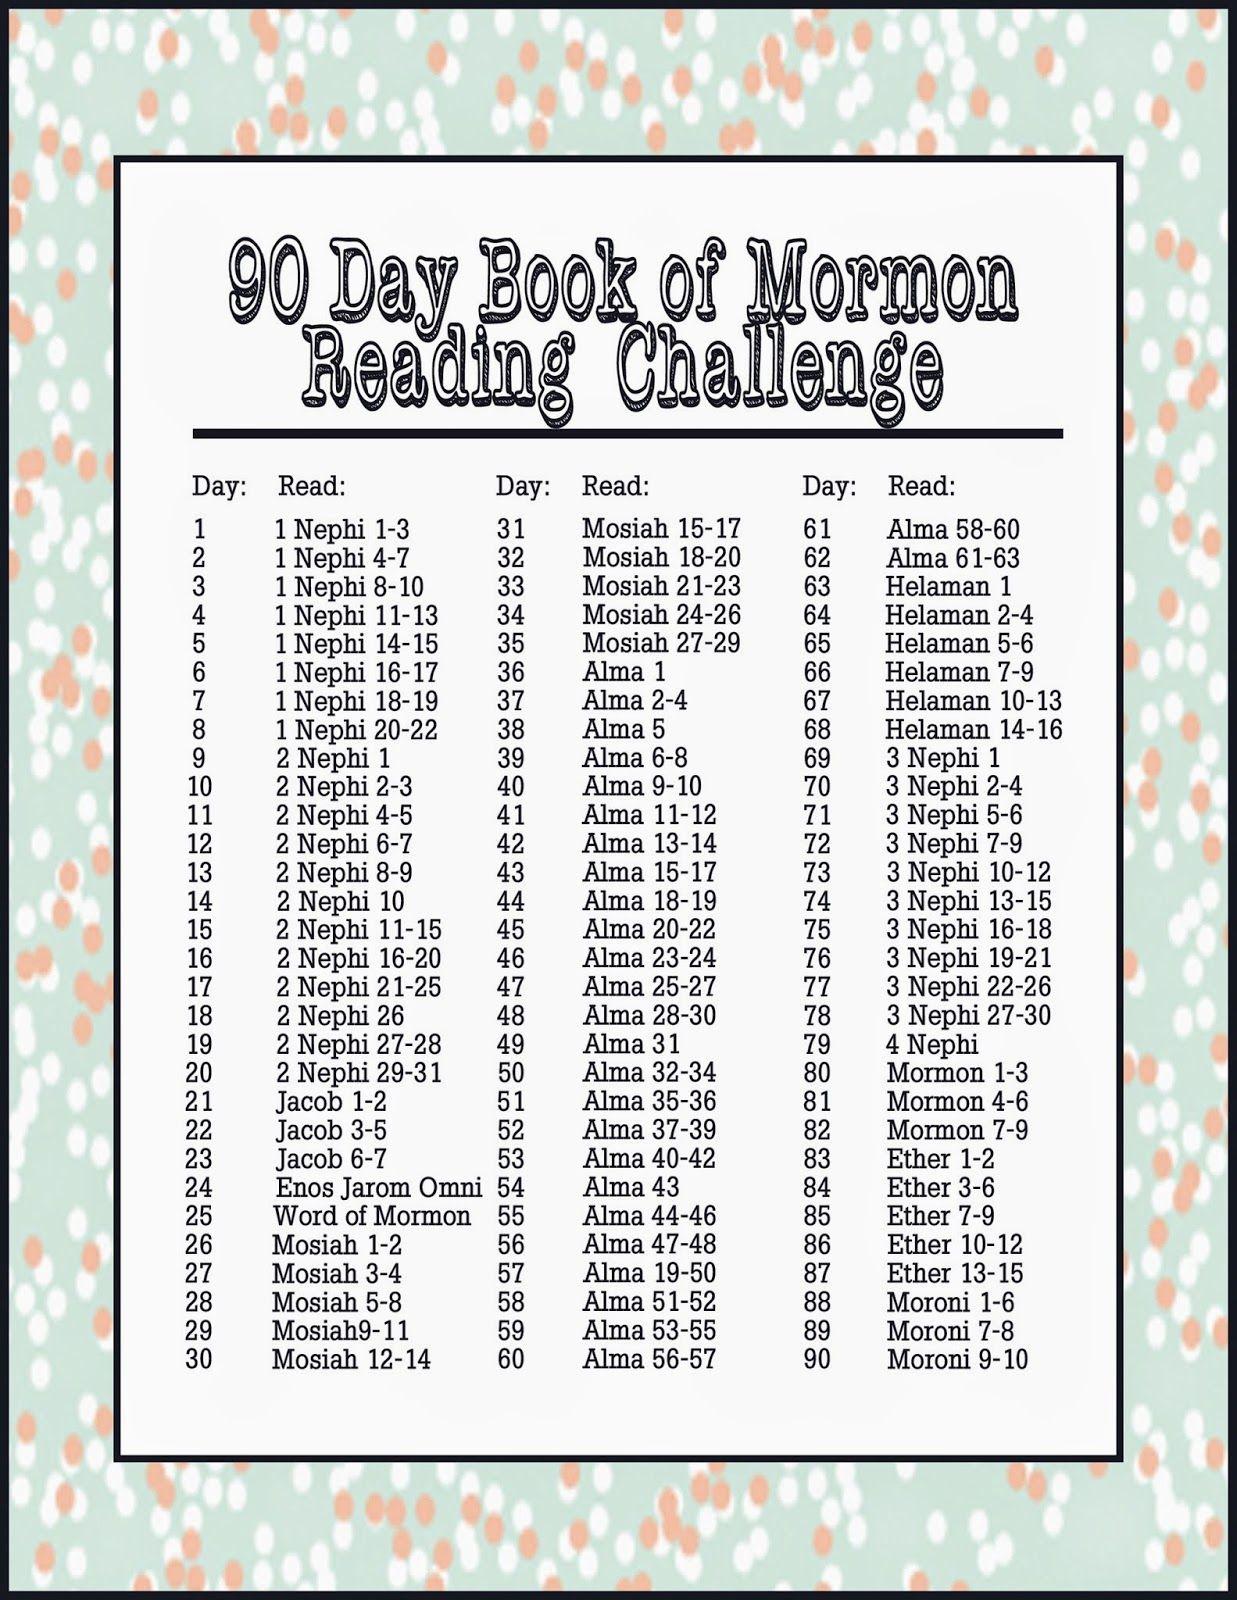 Autumn bennett book of mormon challenge worm hand out also day reading schedule church pinterest rh